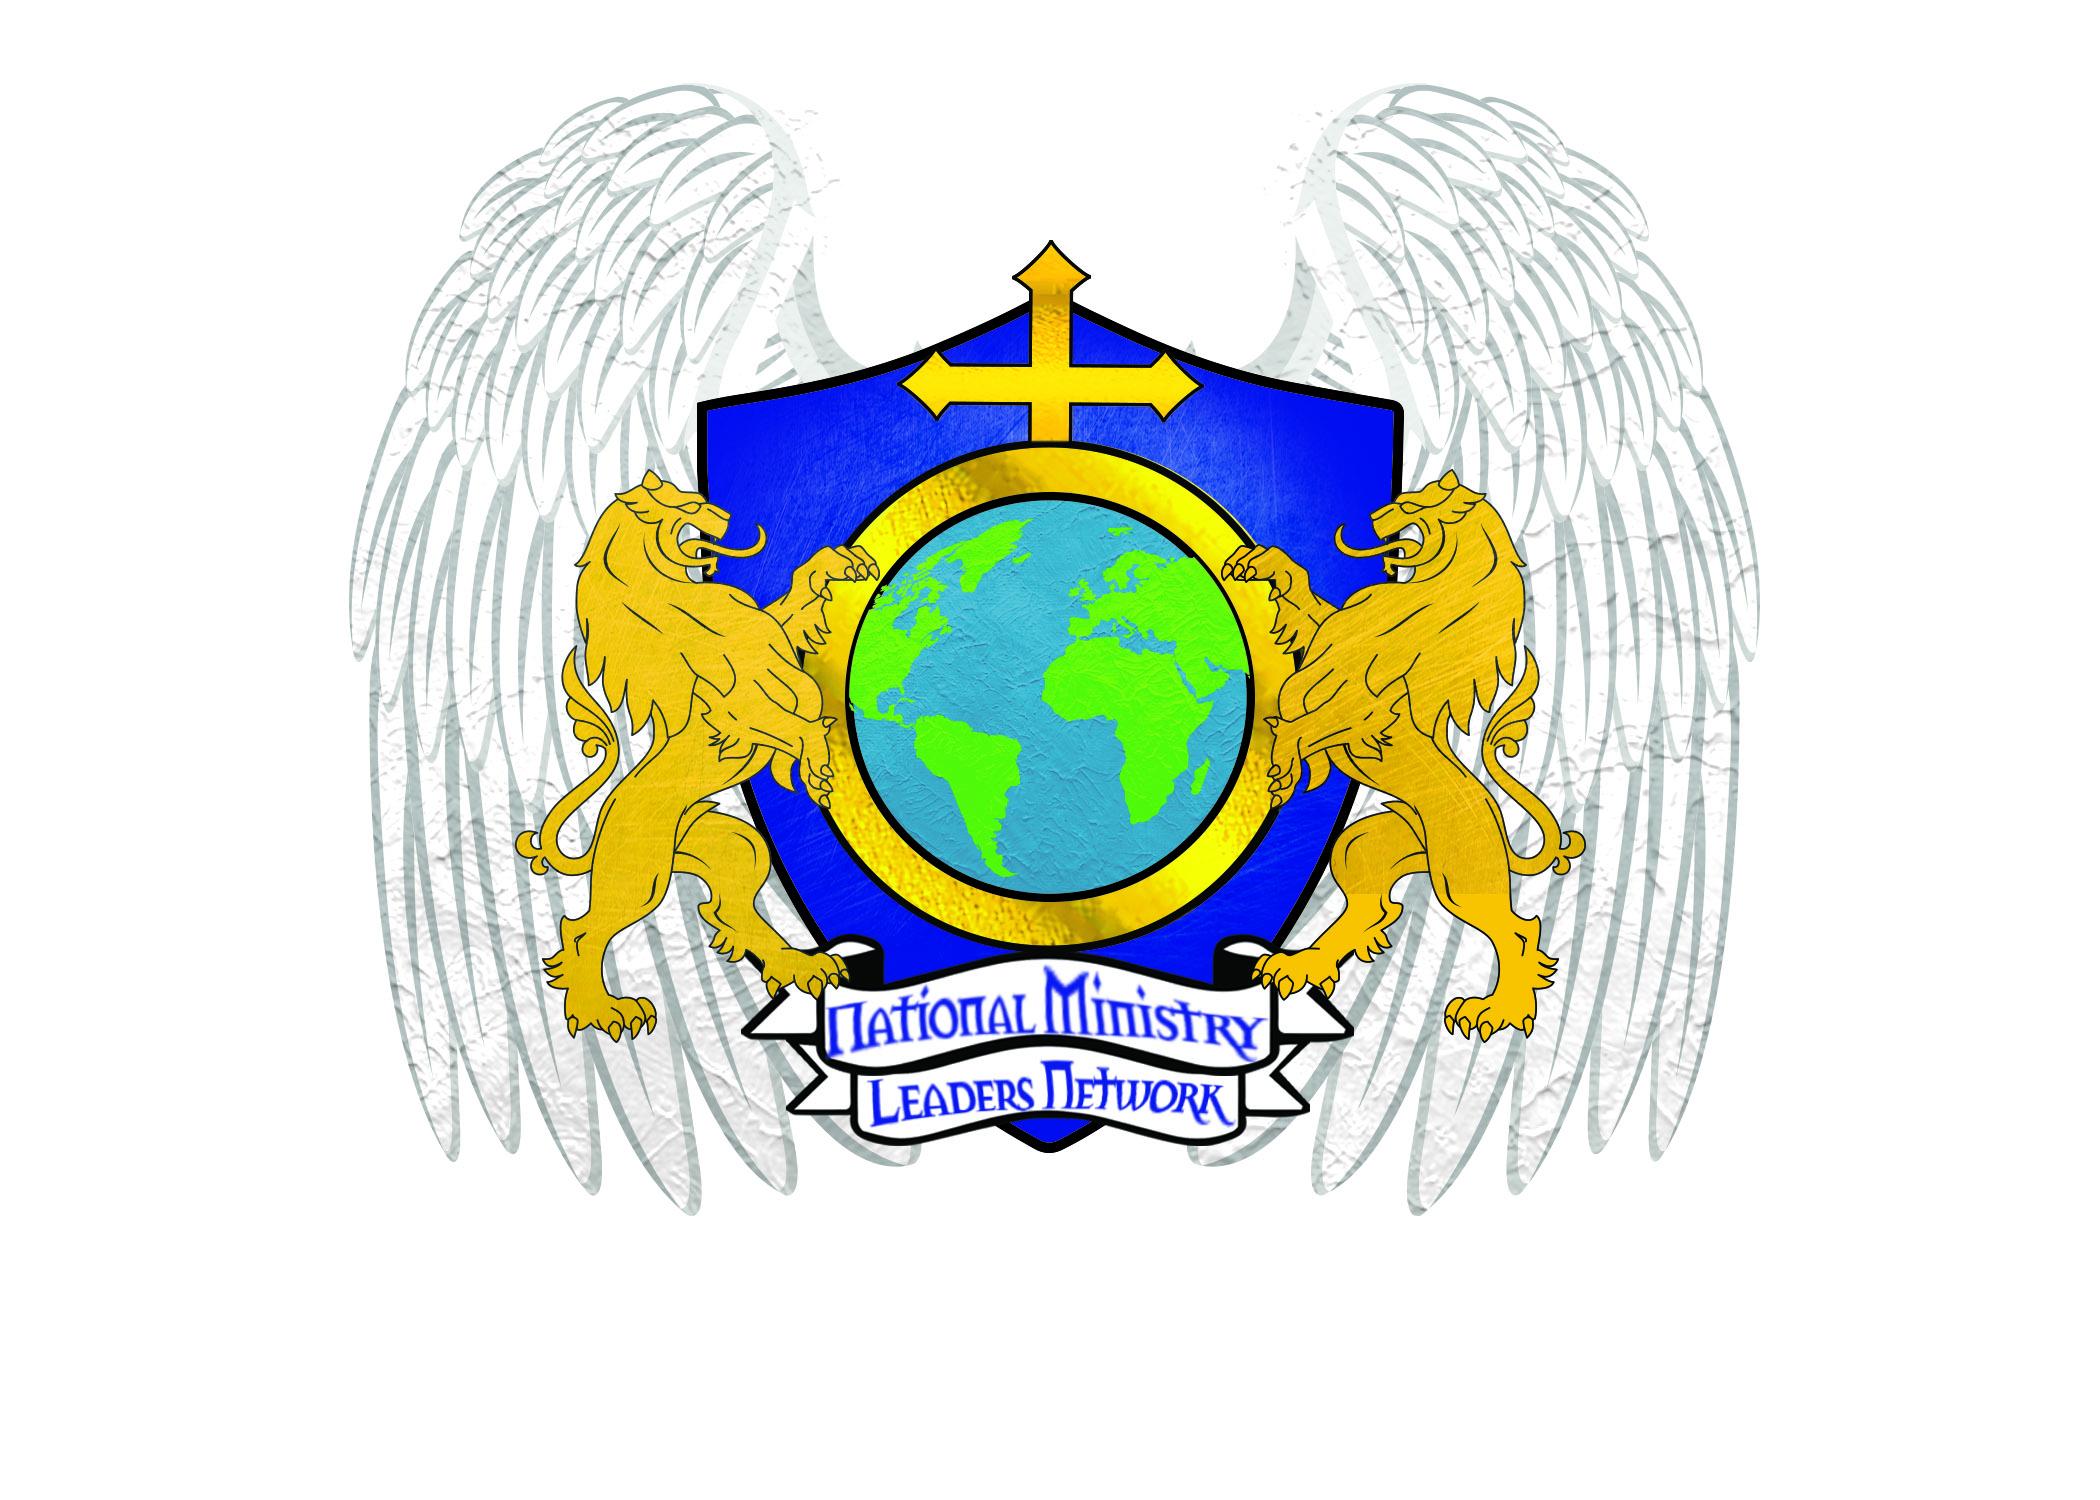 National Minstry Leaders Network